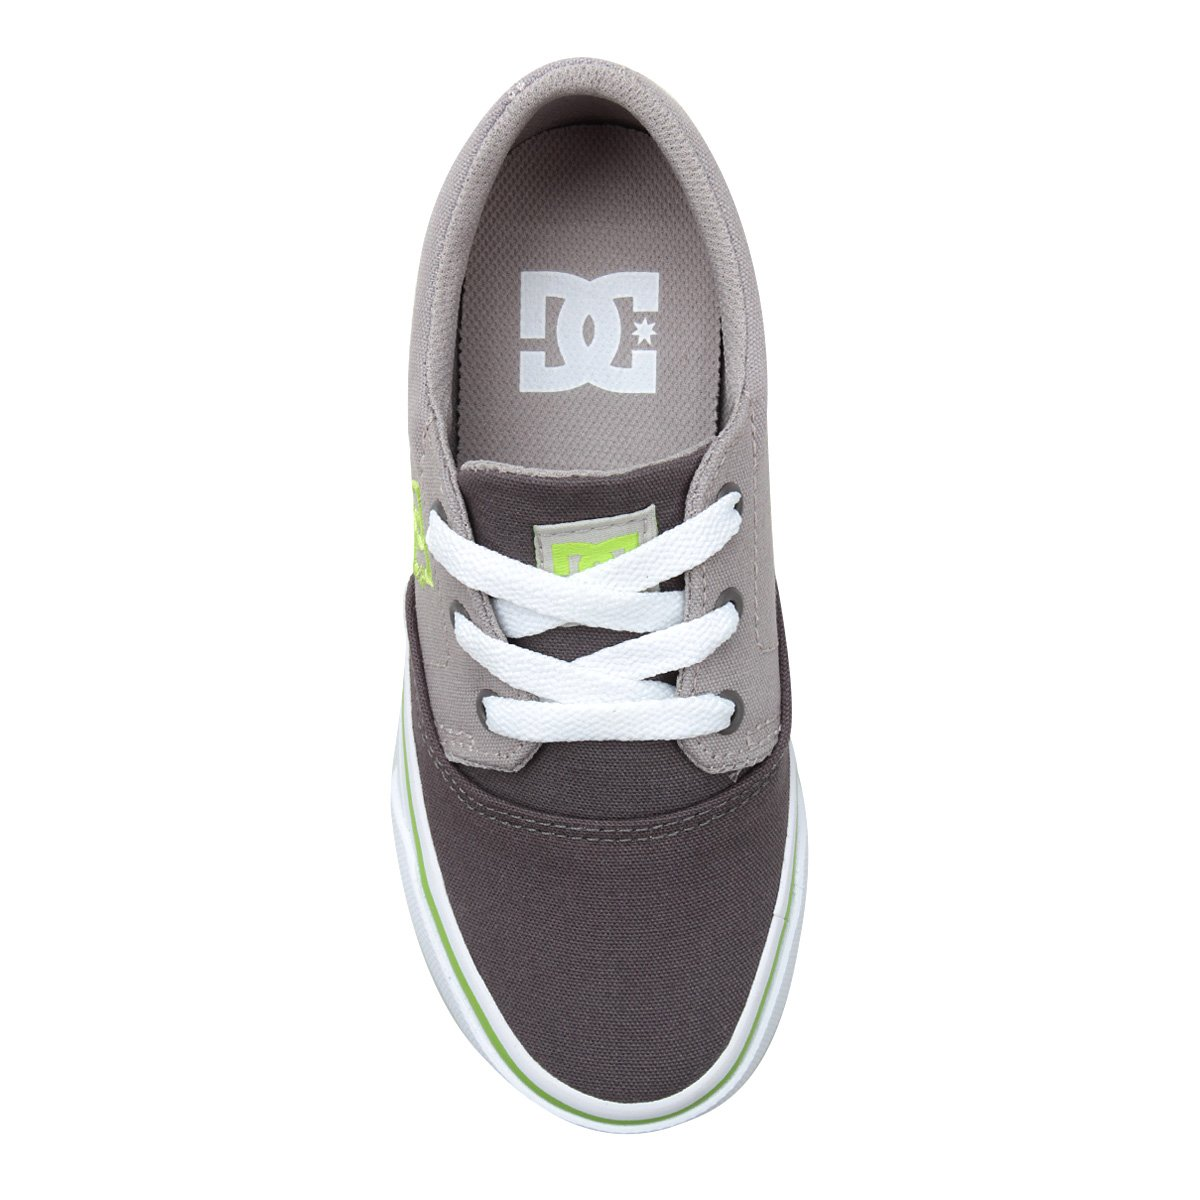 c34eaf75a01eb Tênis Infantil DC Shoes Flash 2 Tx La Masculino